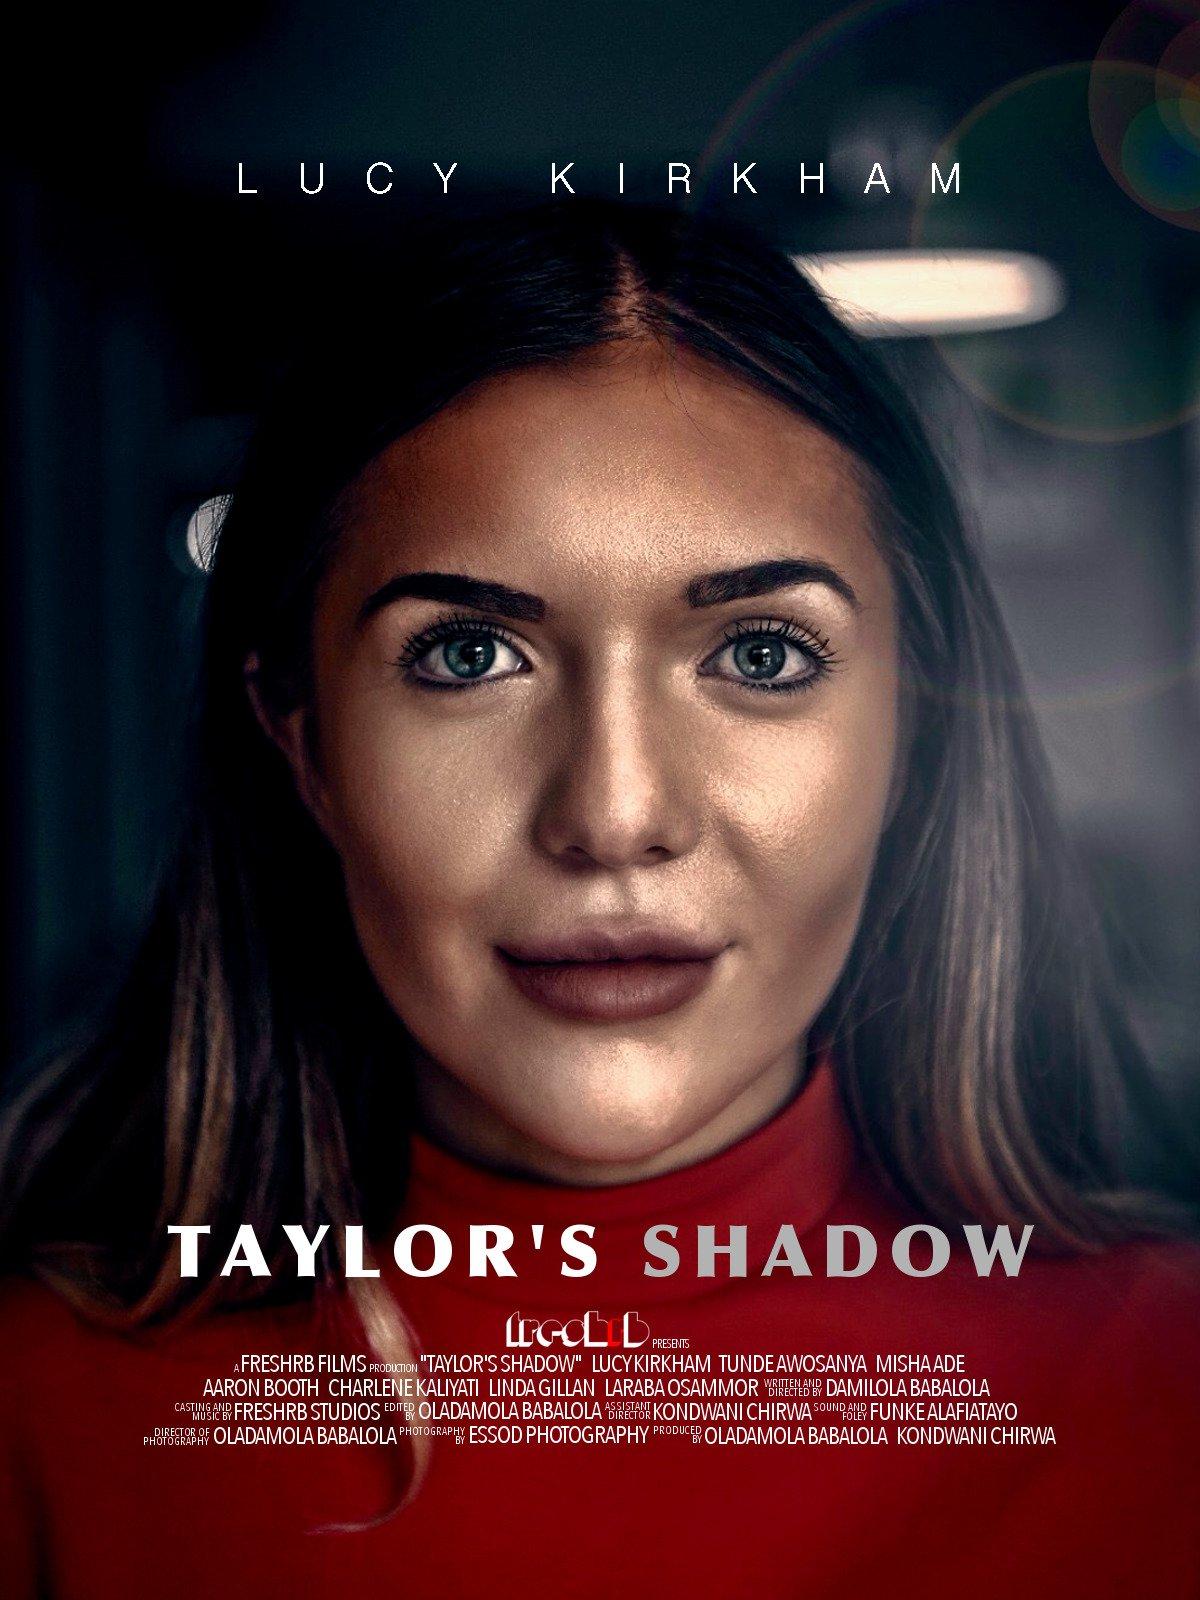 Taylor's Shadow